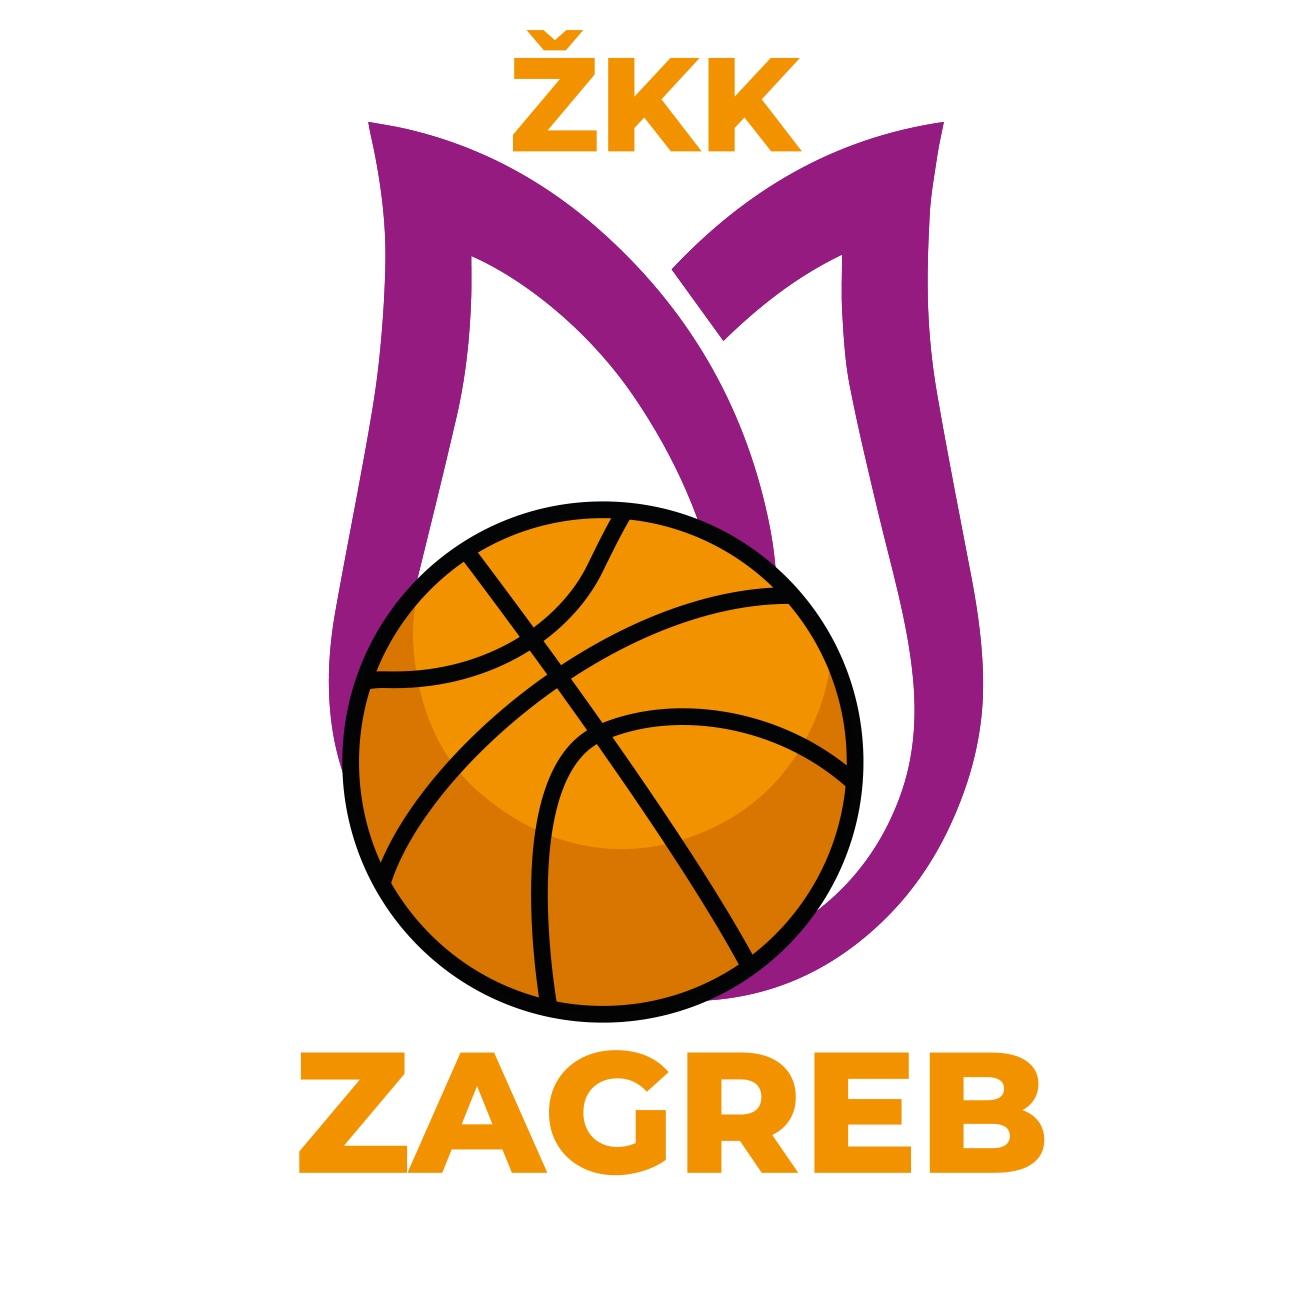 ŽKK Zagreb